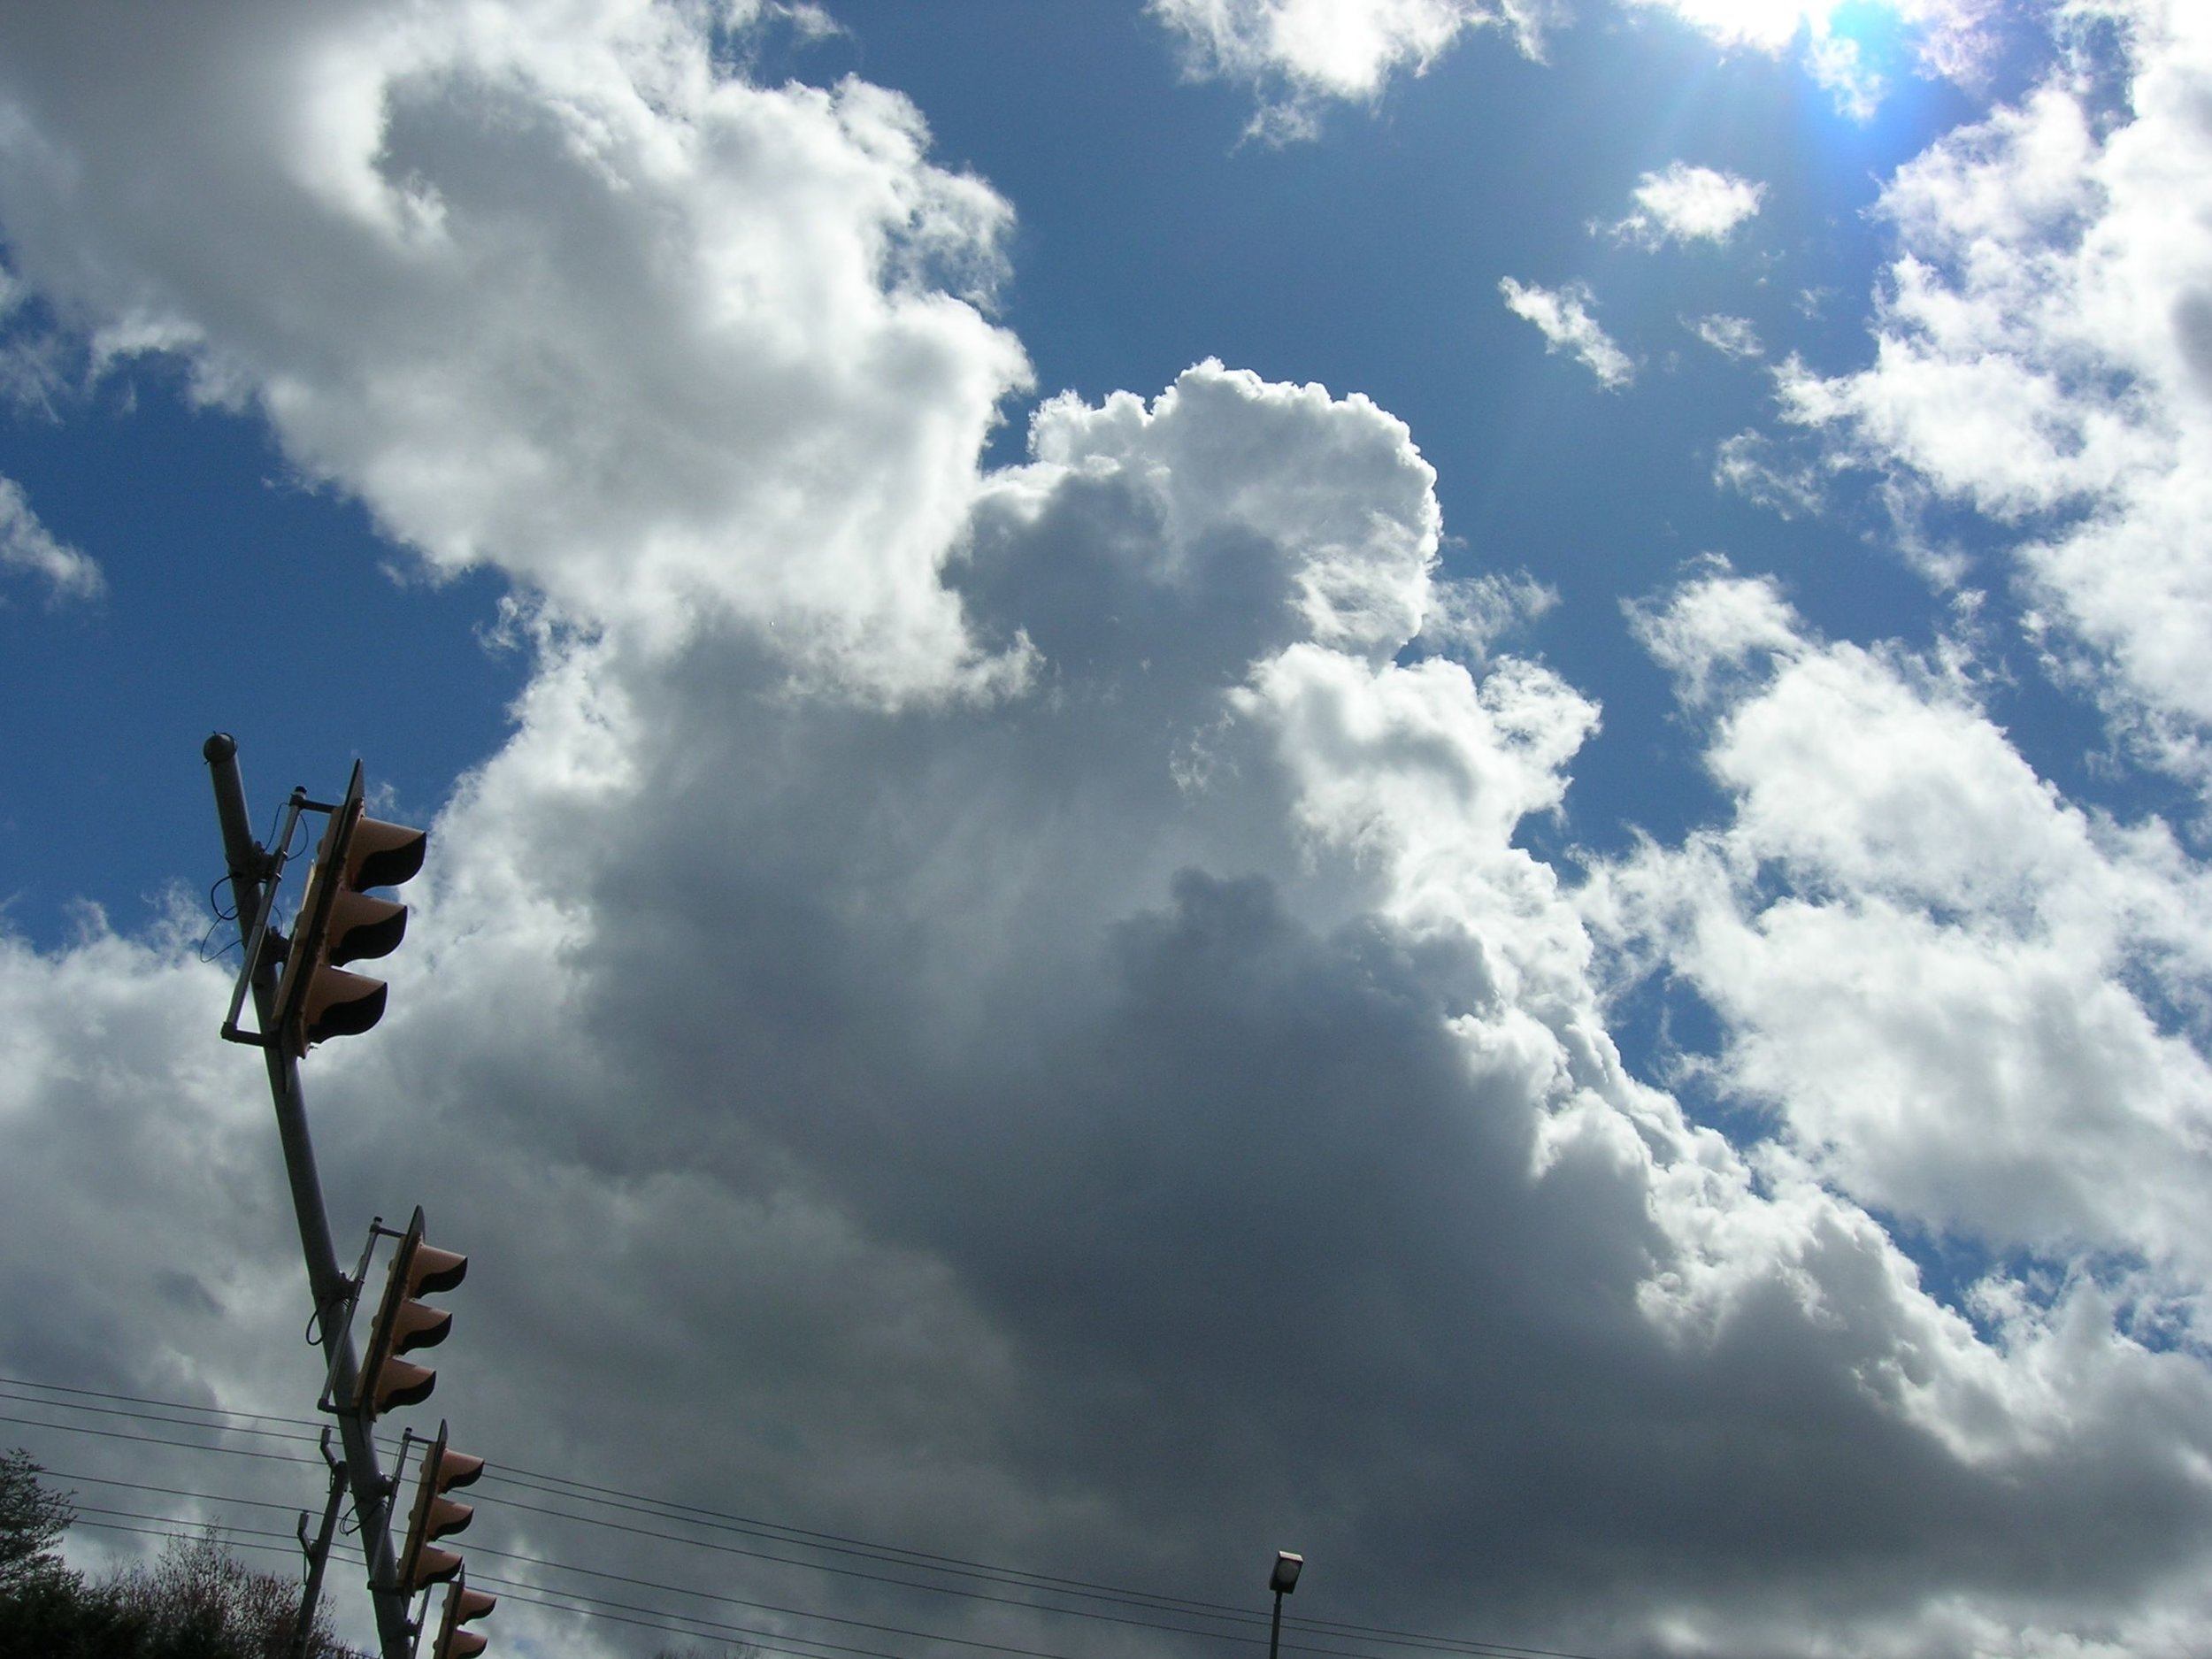 traffic lights and cloud.jpg